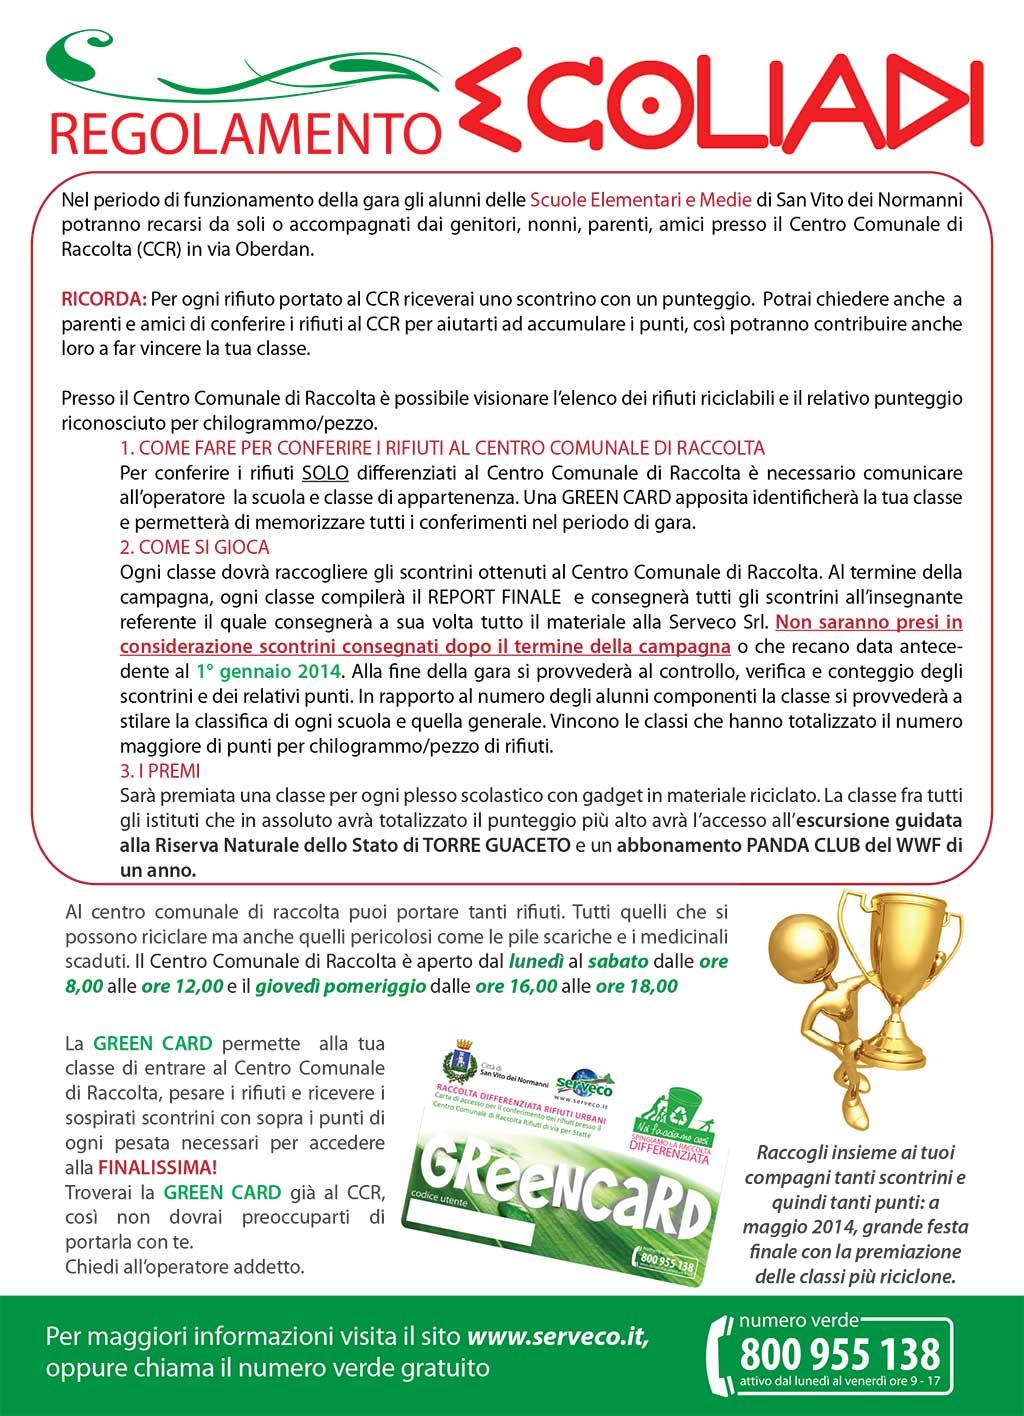 ecoliadi-regolamento